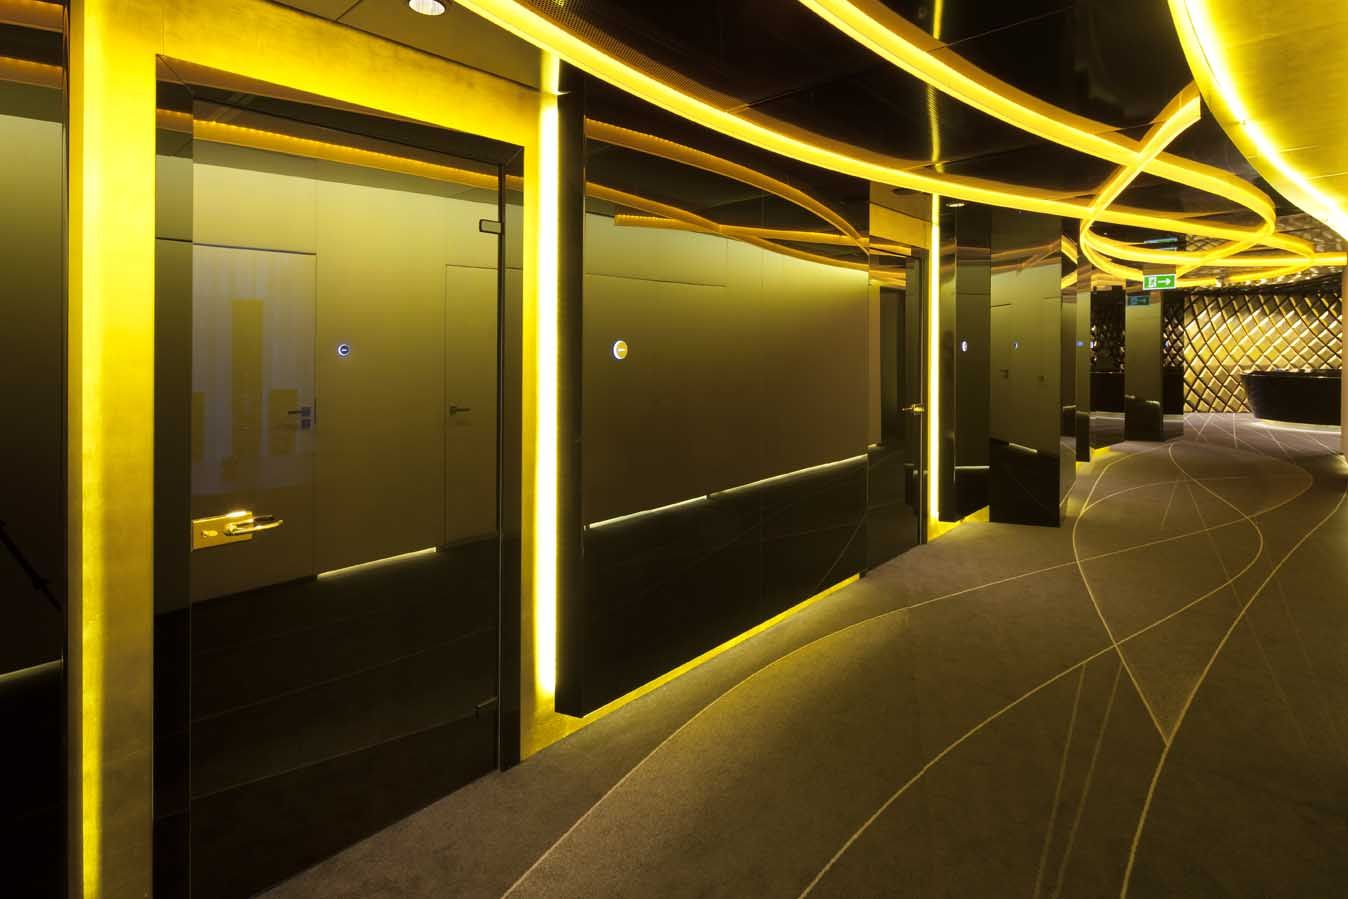 Pko bank polski by robert majkut design poland office healthcare